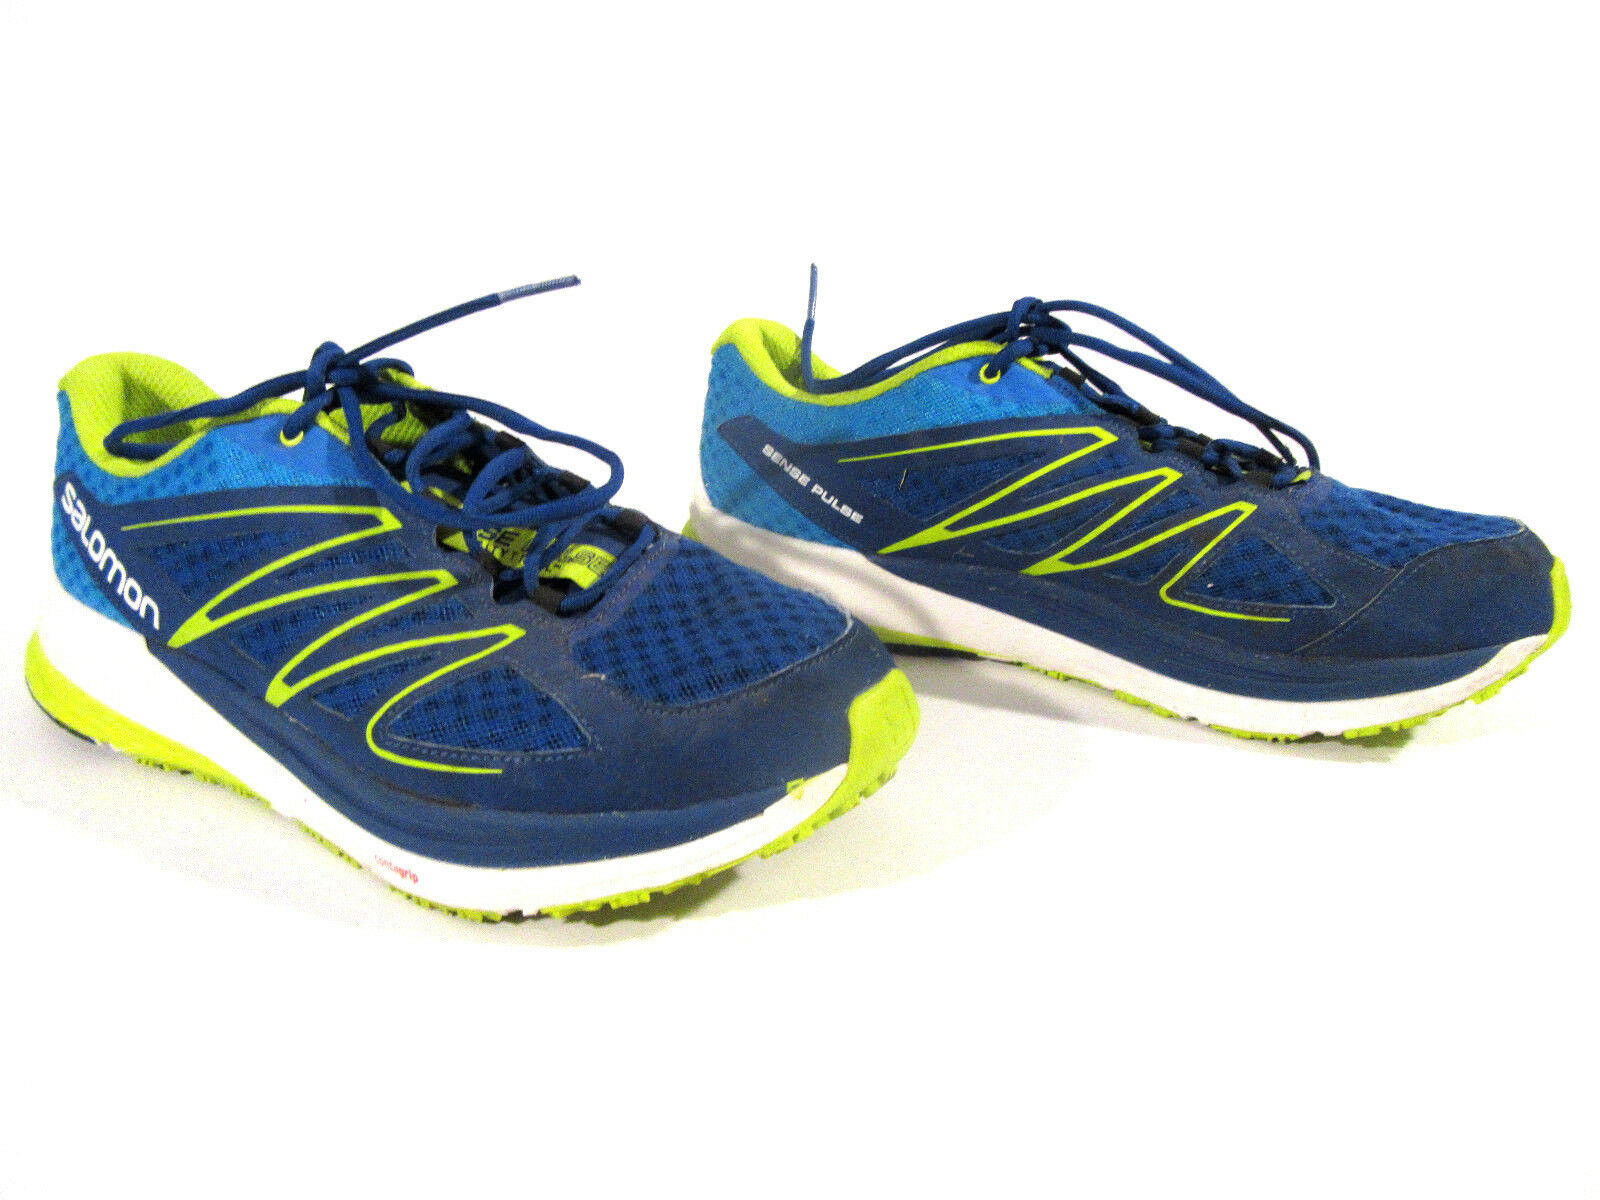 Salomon Men's Sense Pulse Gentiane Athletic Running shoes sz 12.5 378335